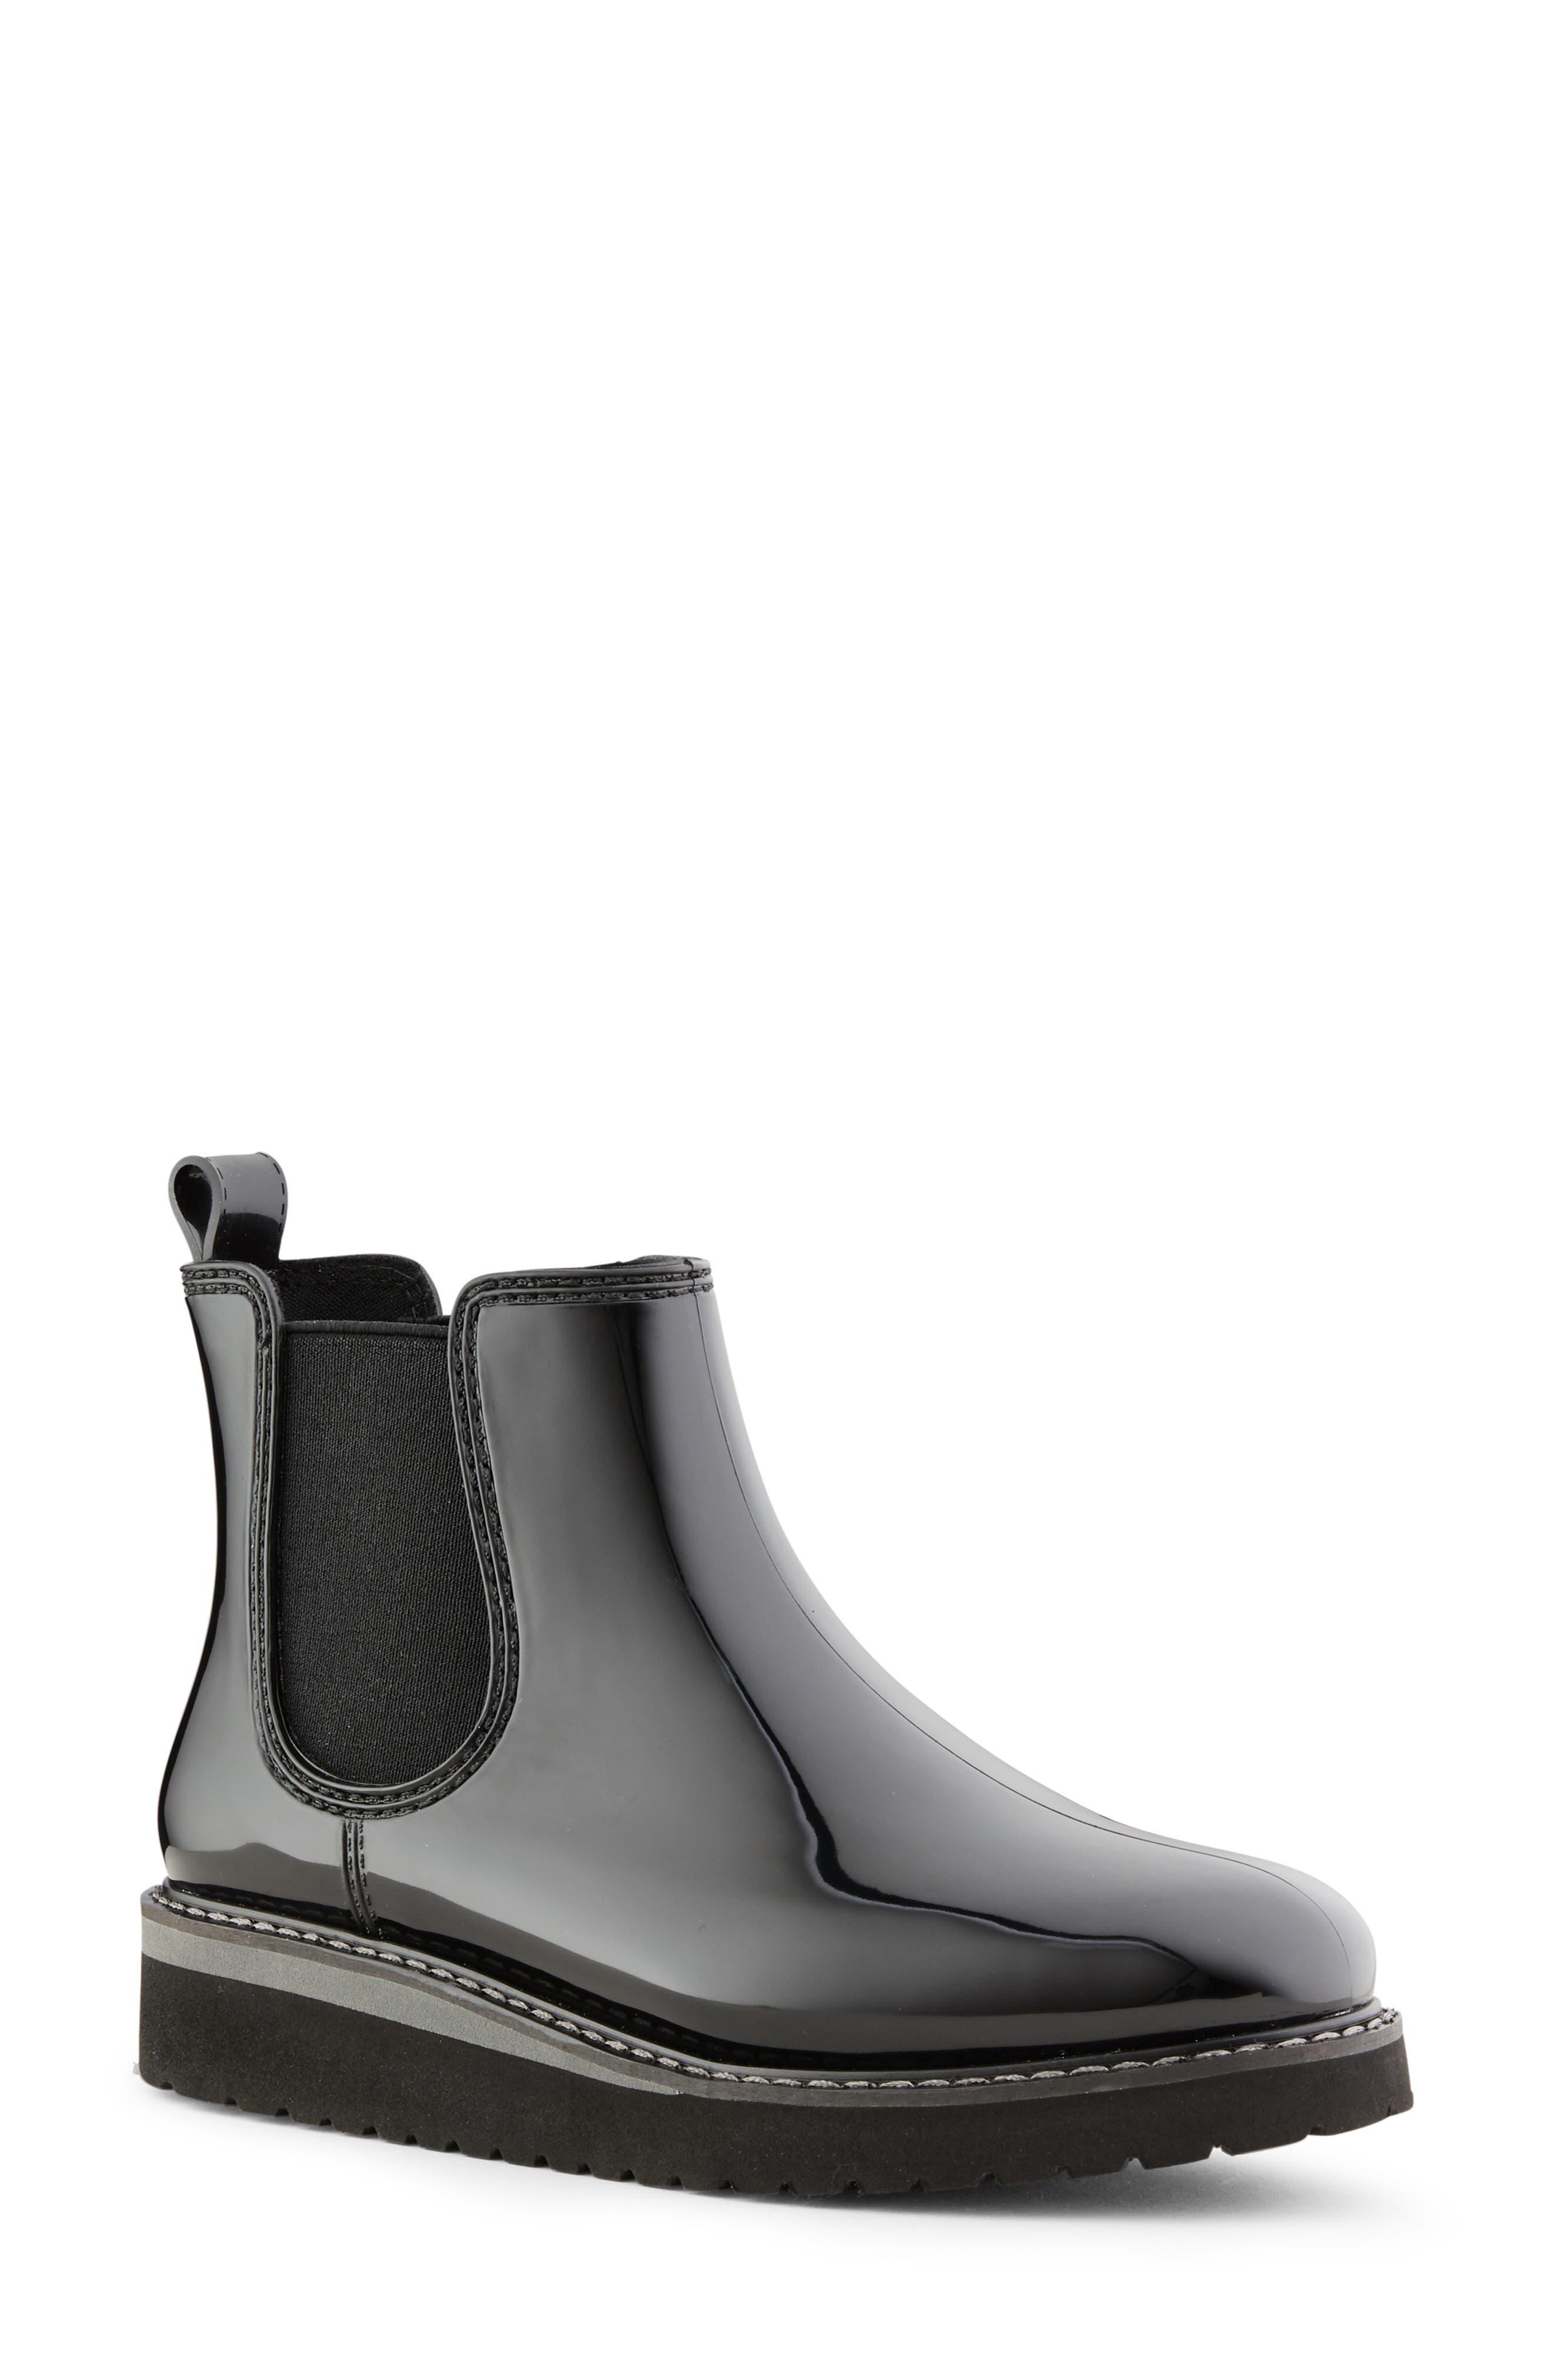 COUGAR Kensington Chelsea Rain Boot, Main, color, BLACK/ CHARCOAL